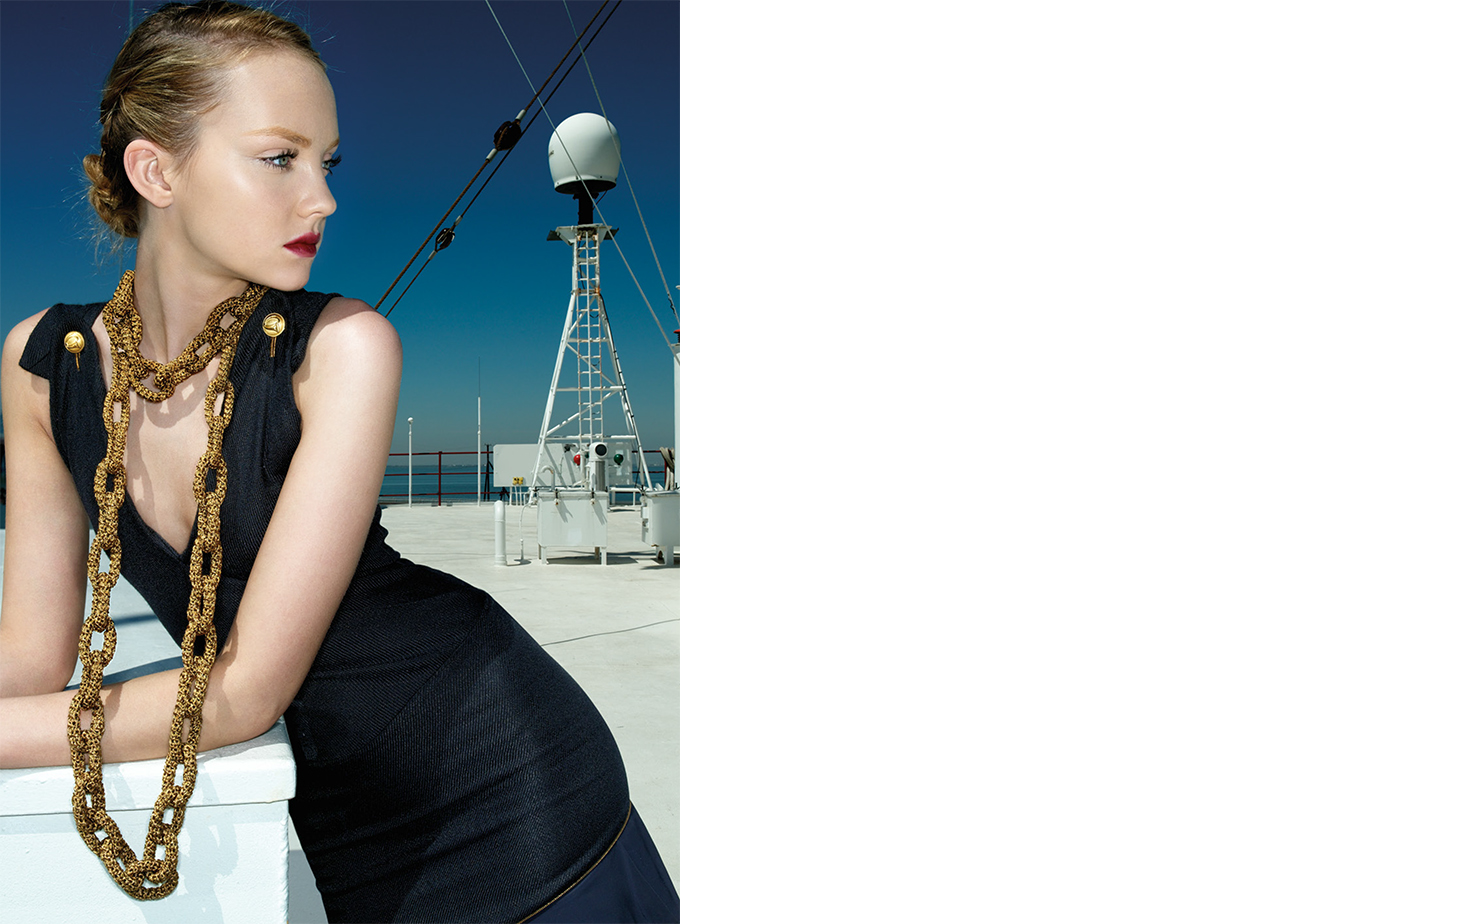 Vogue OUTWARD BOUND   FASHION EDITOR Elissa Santisi MODEL Heather Marks